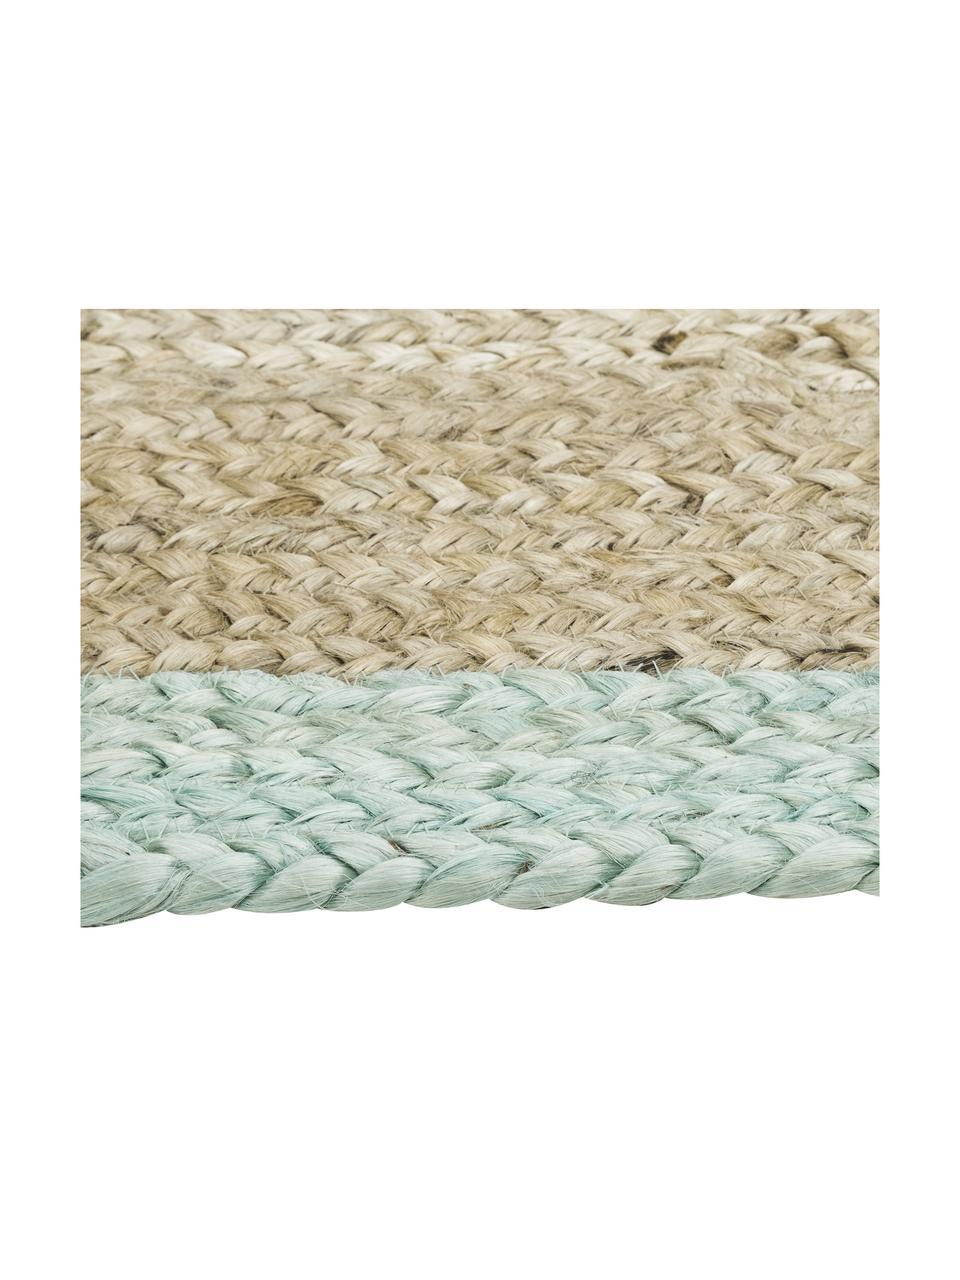 Tappeto in juta tessuto a mano Shanta, 100% juta, Juta, verde menta, Larg. 160 x Lung. 230 cm